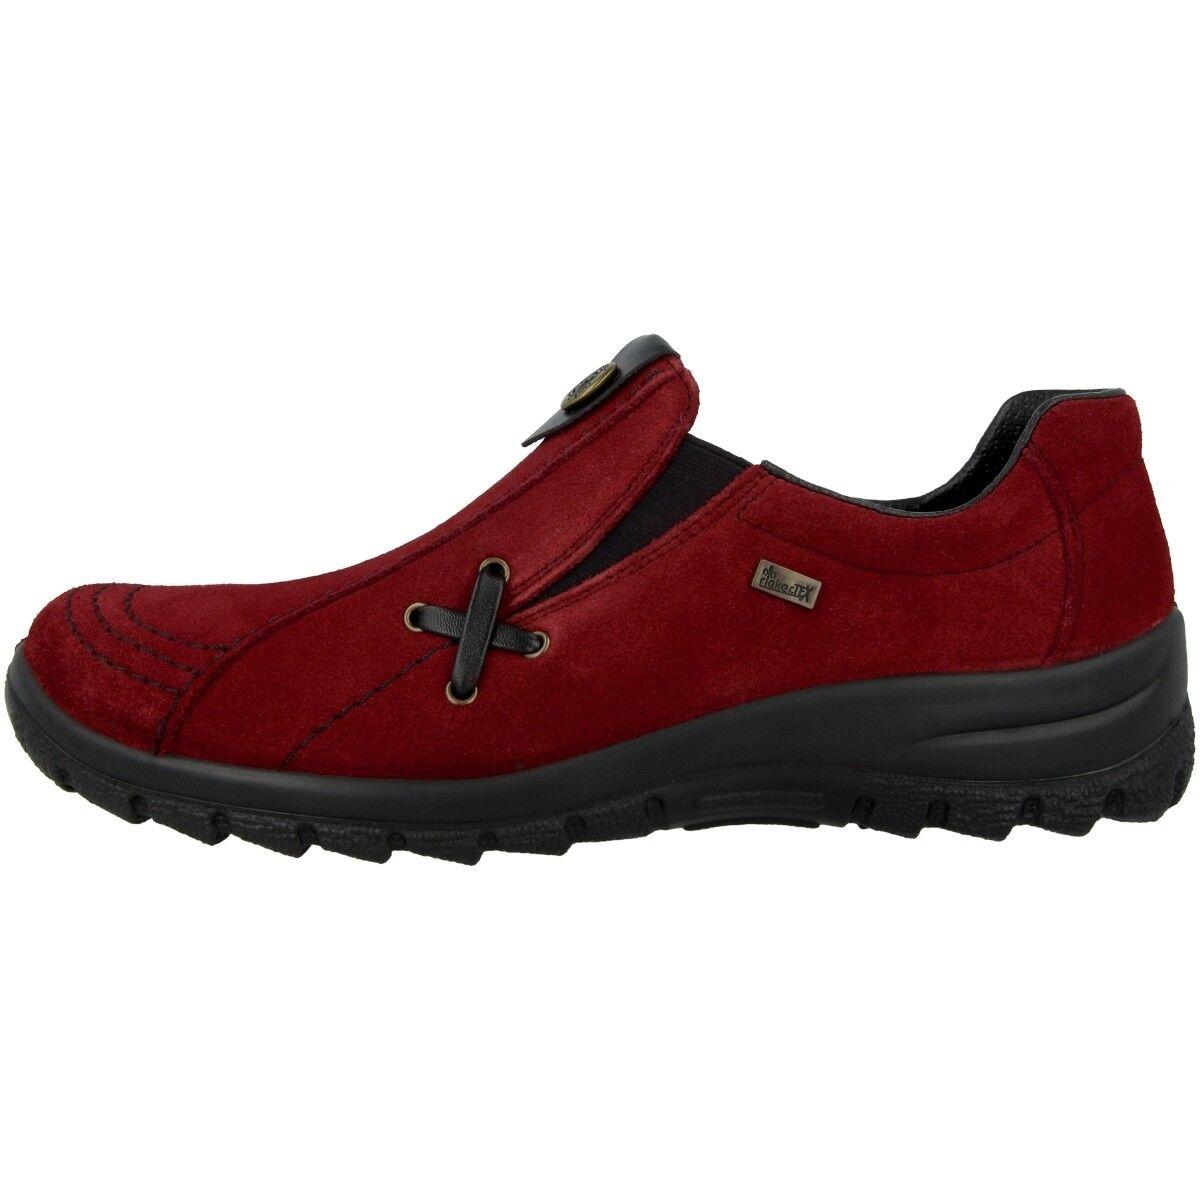 Rieker Samtcalf-Fino Schuhe Damen Slipper Freizeit Sneaker Halbschuhe L7171-35